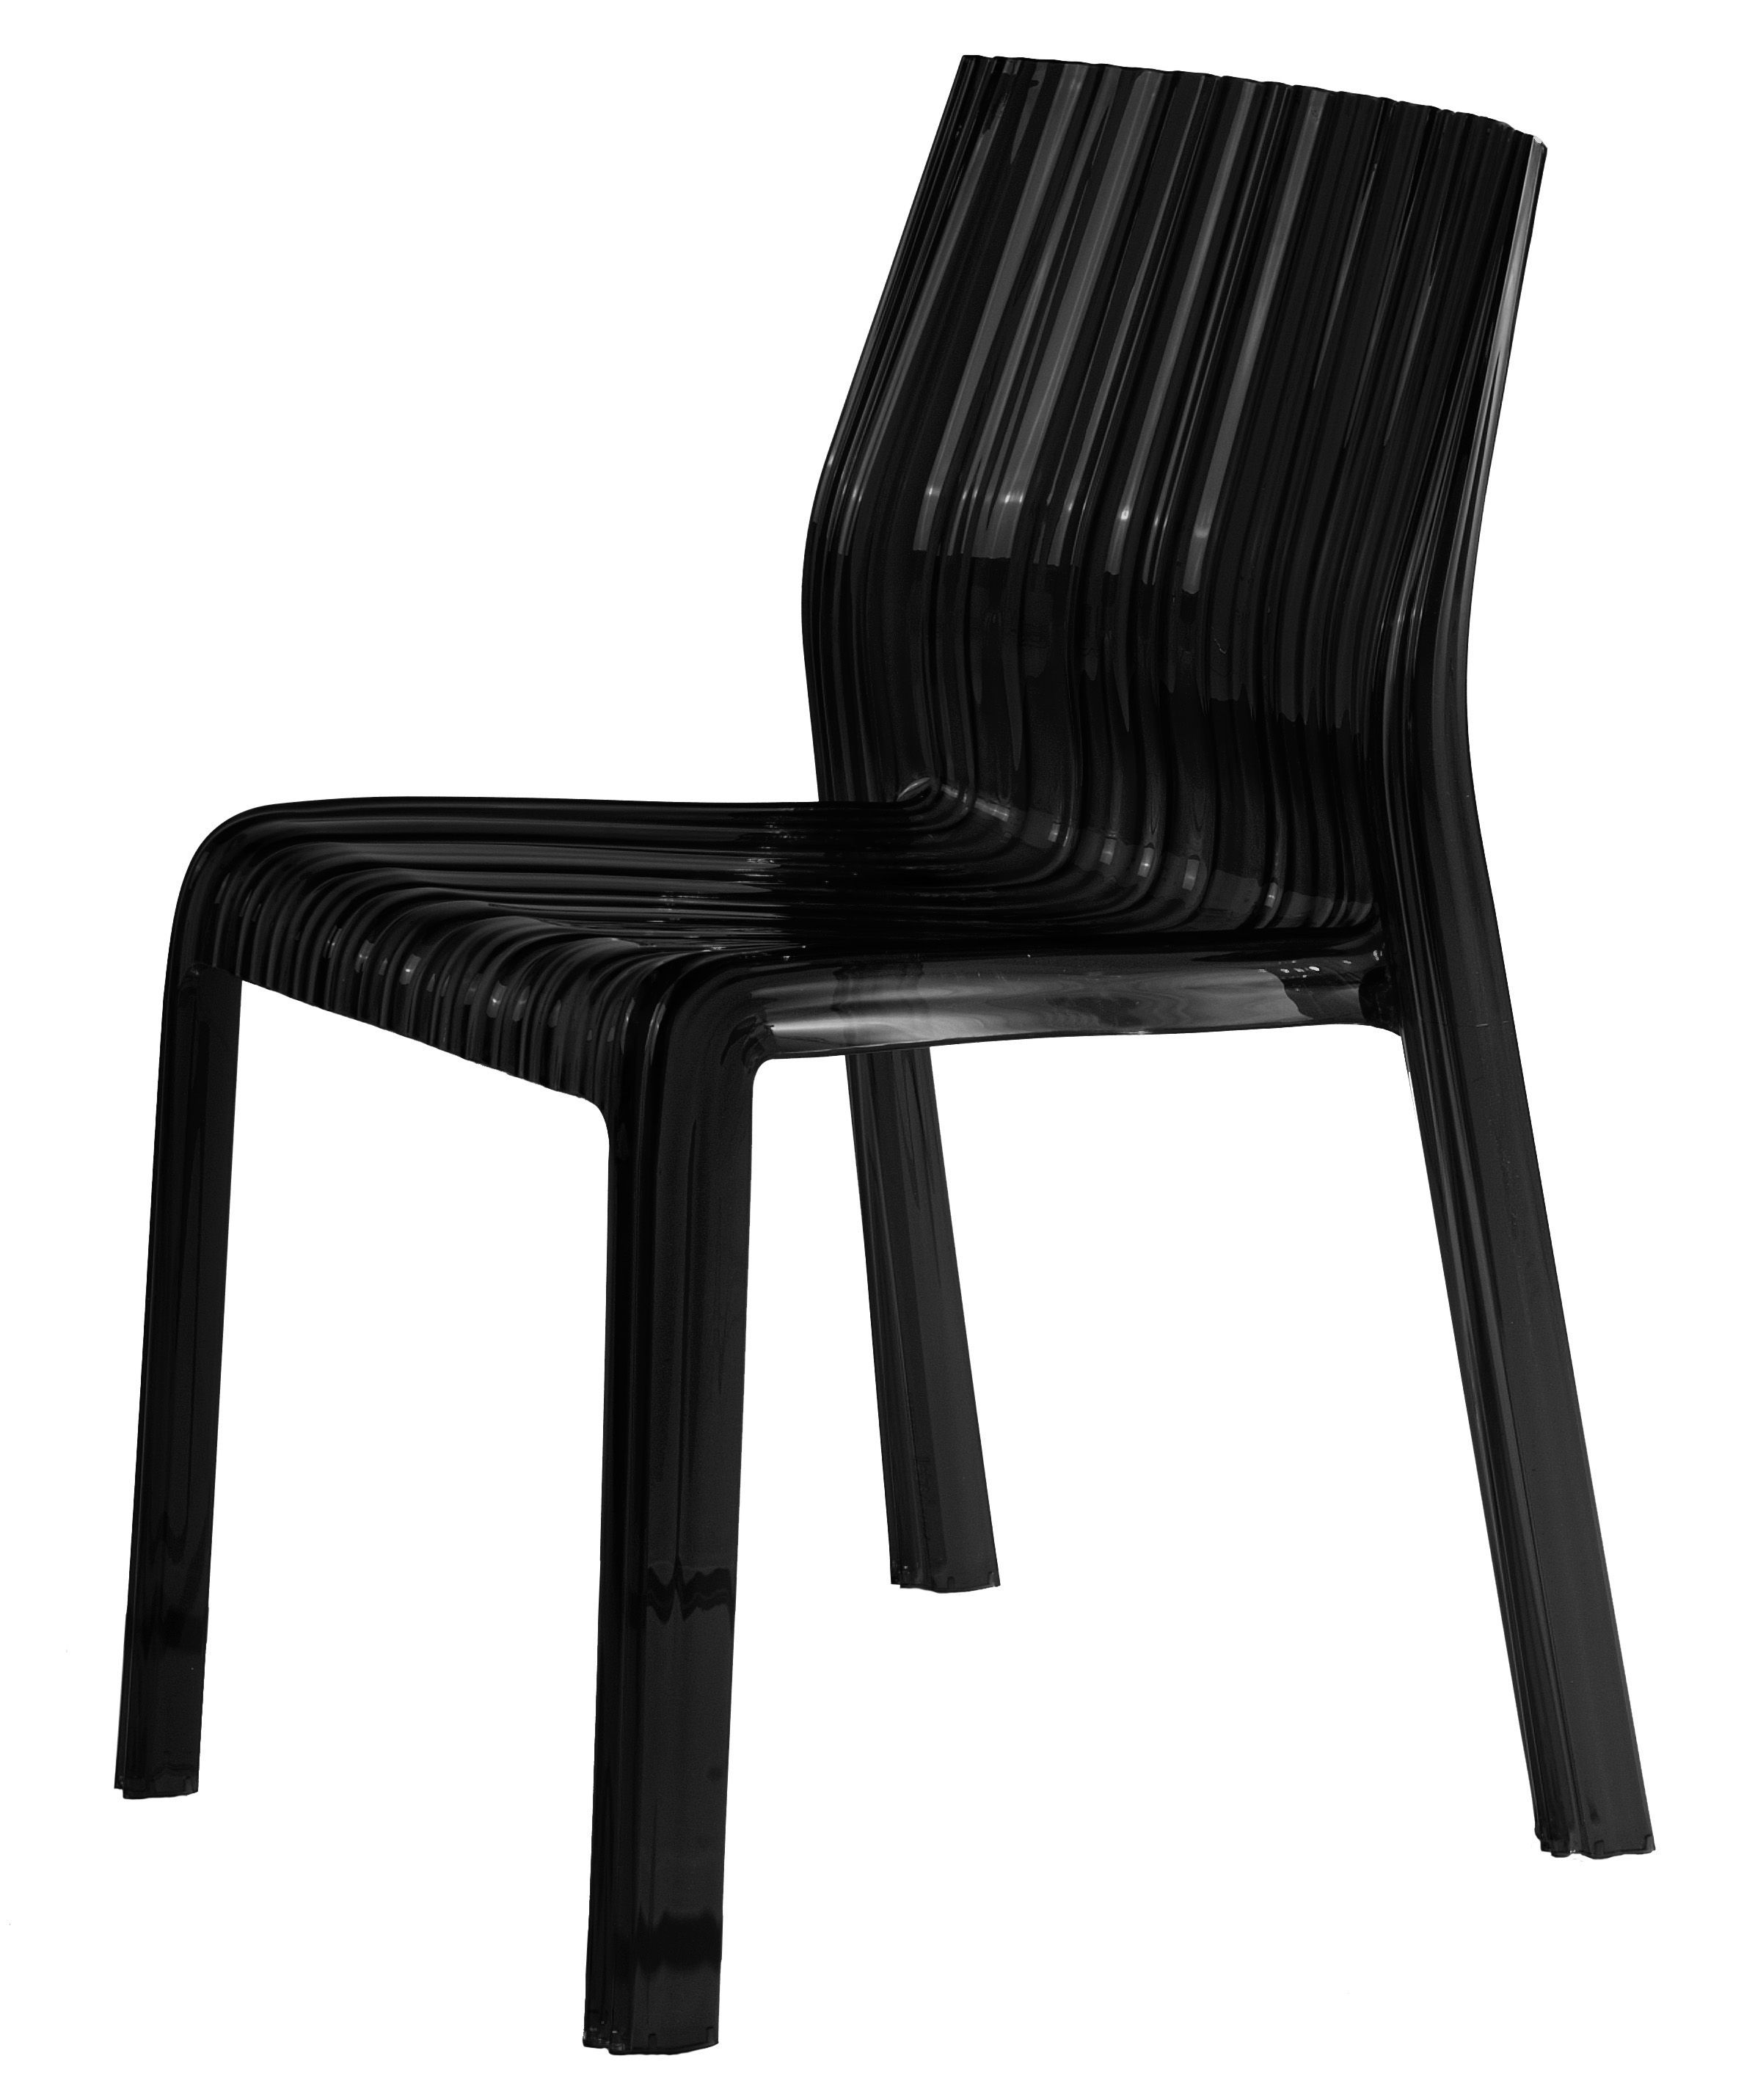 Möbel - Stühle  - Frilly Stapelbarer Stuhl Opak-Ausführung - Kartell - Opakschwarz - Polykarbonat